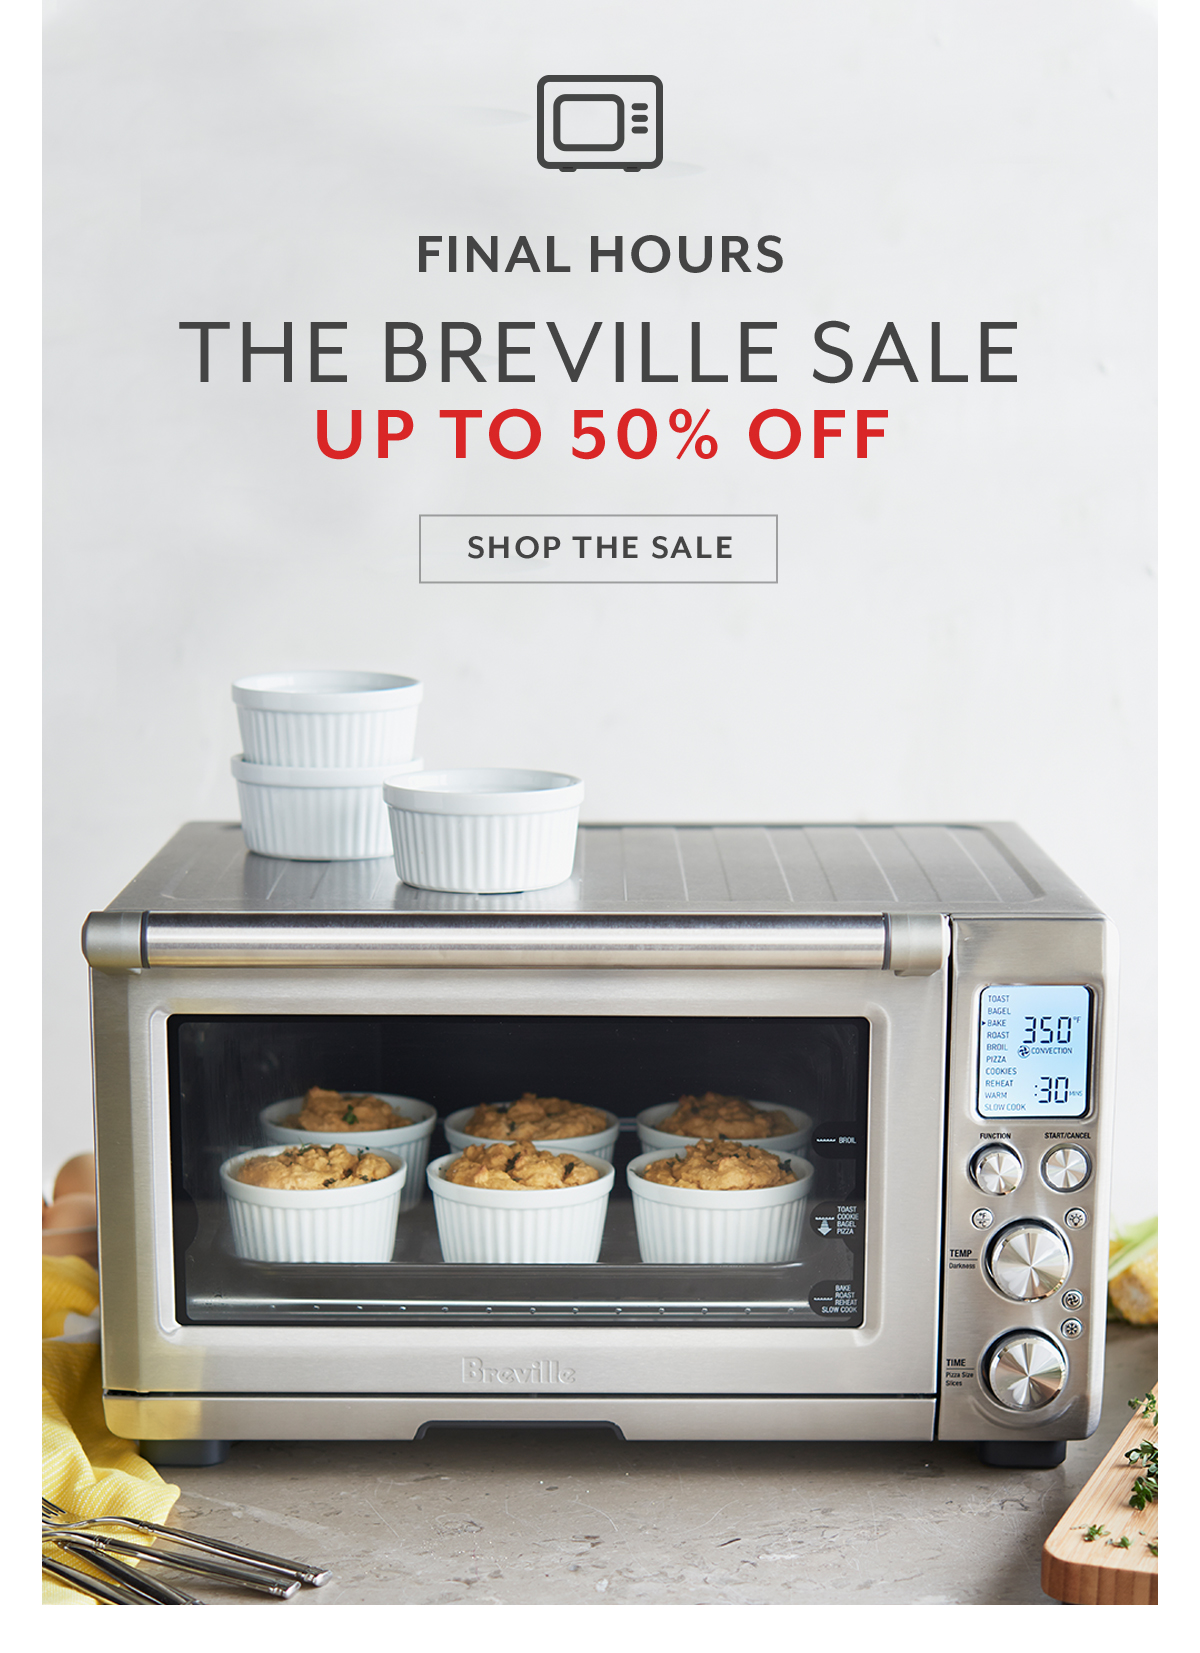 The Breville Sale